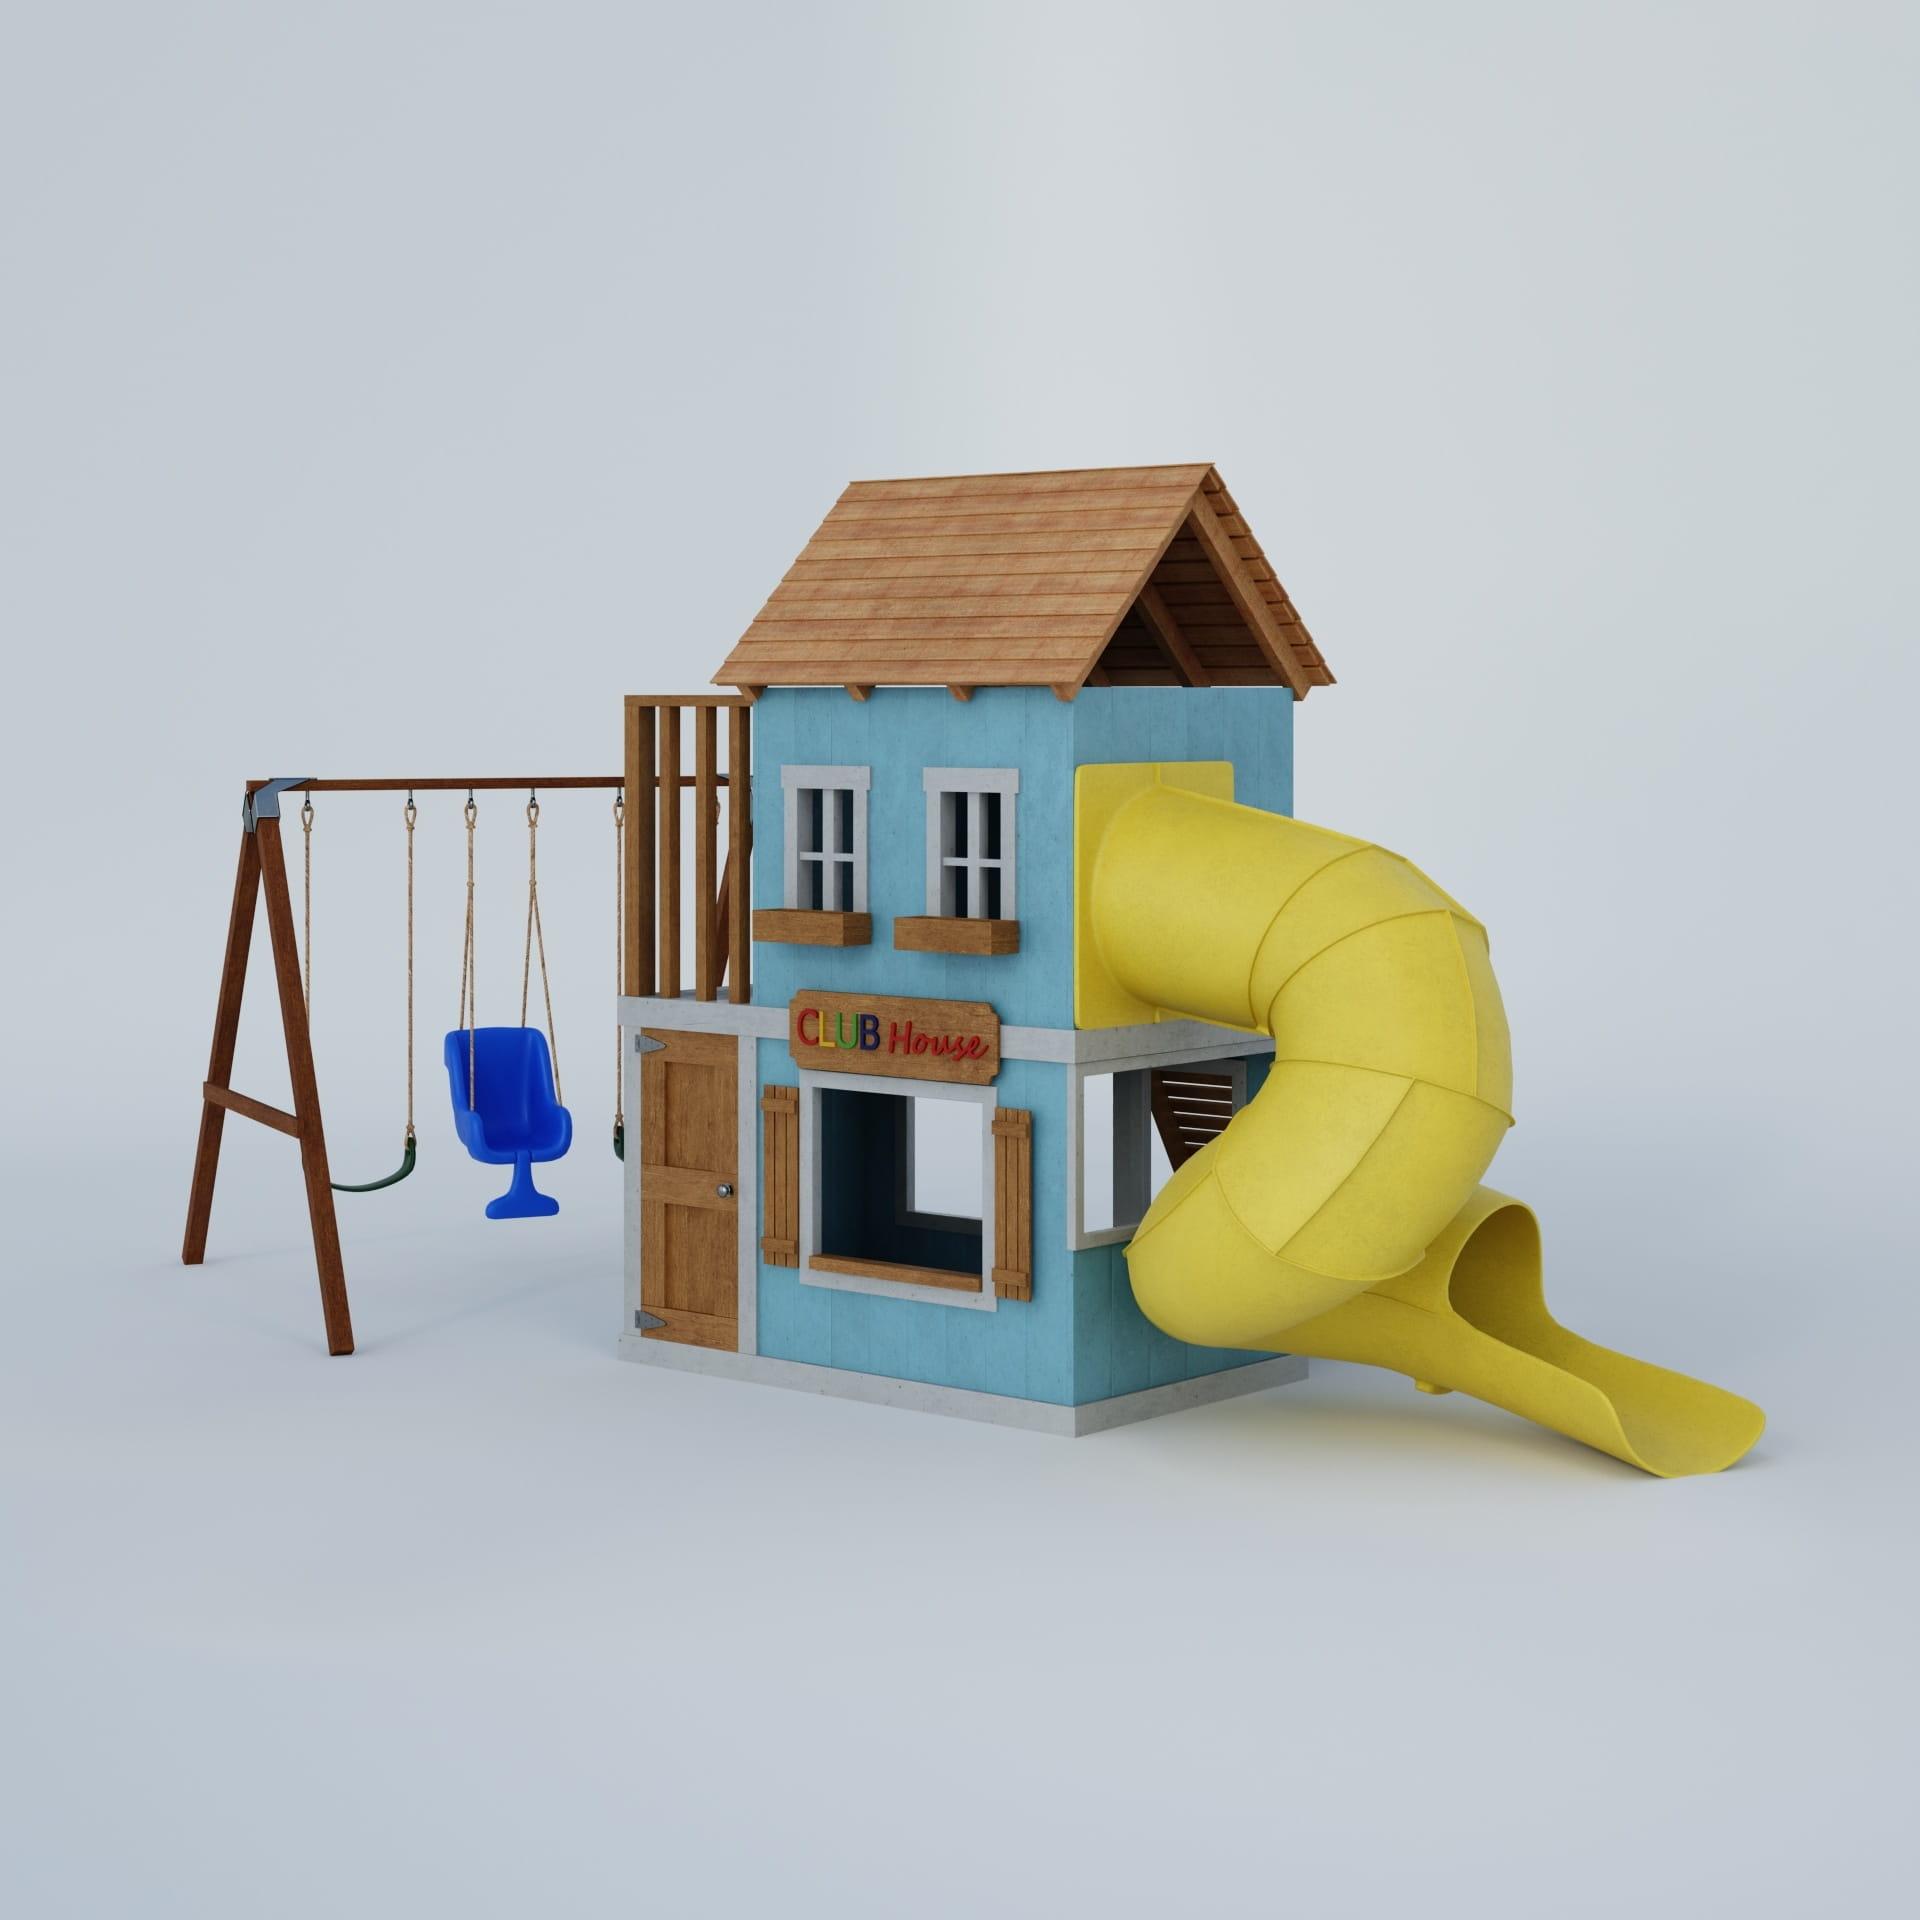 playground equipment 32 AM244 Archmodels